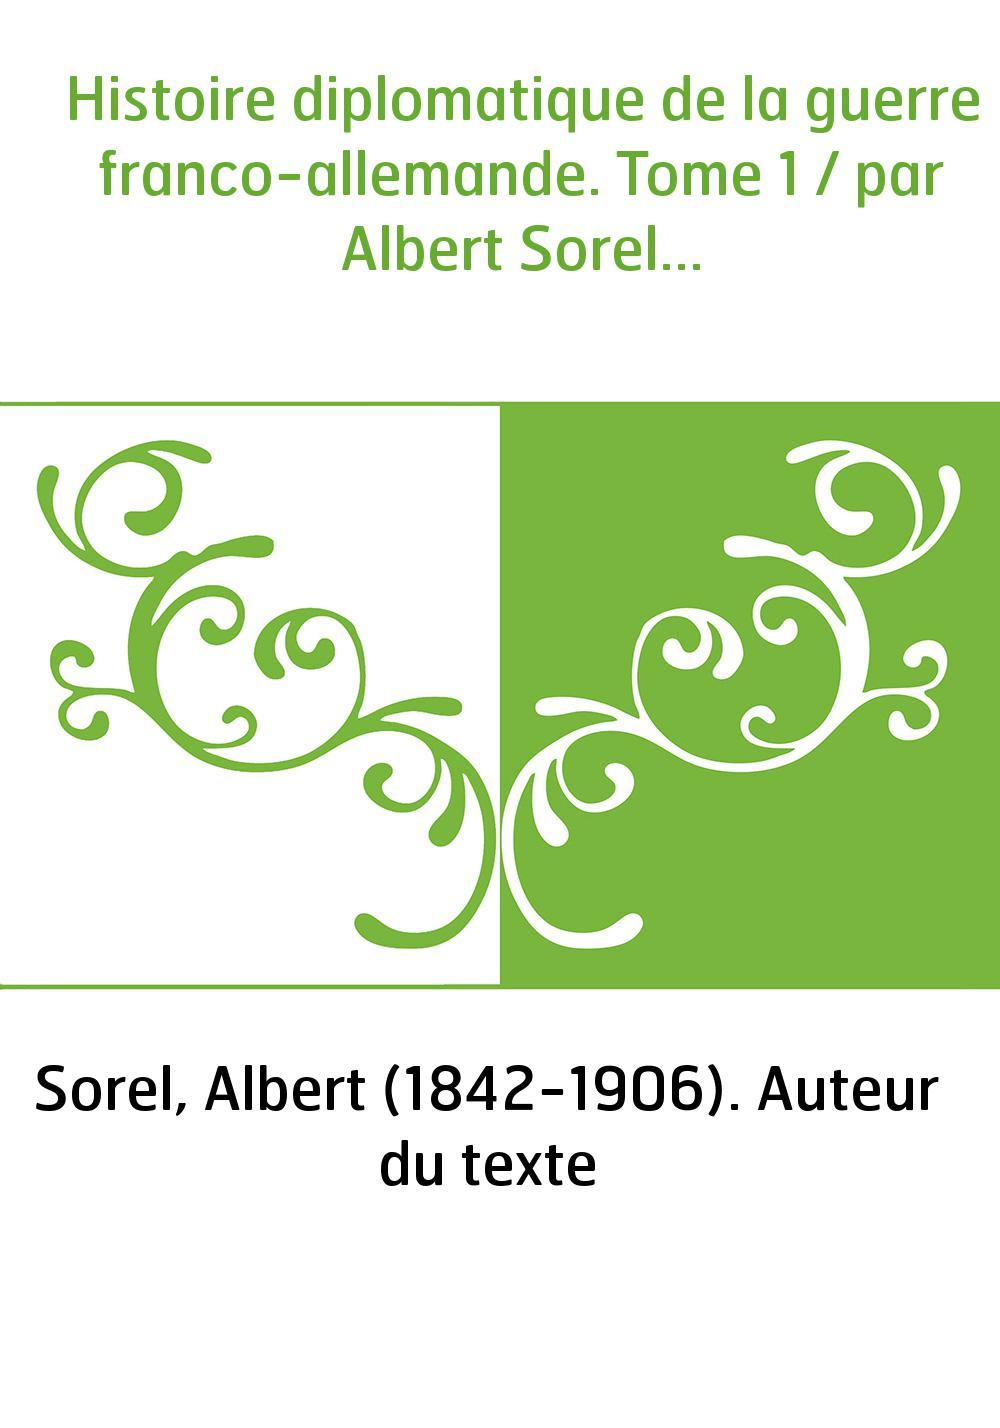 Histoire diplomatique de la guerre franco-allemande. Tome 1 / par Albert Sorel...